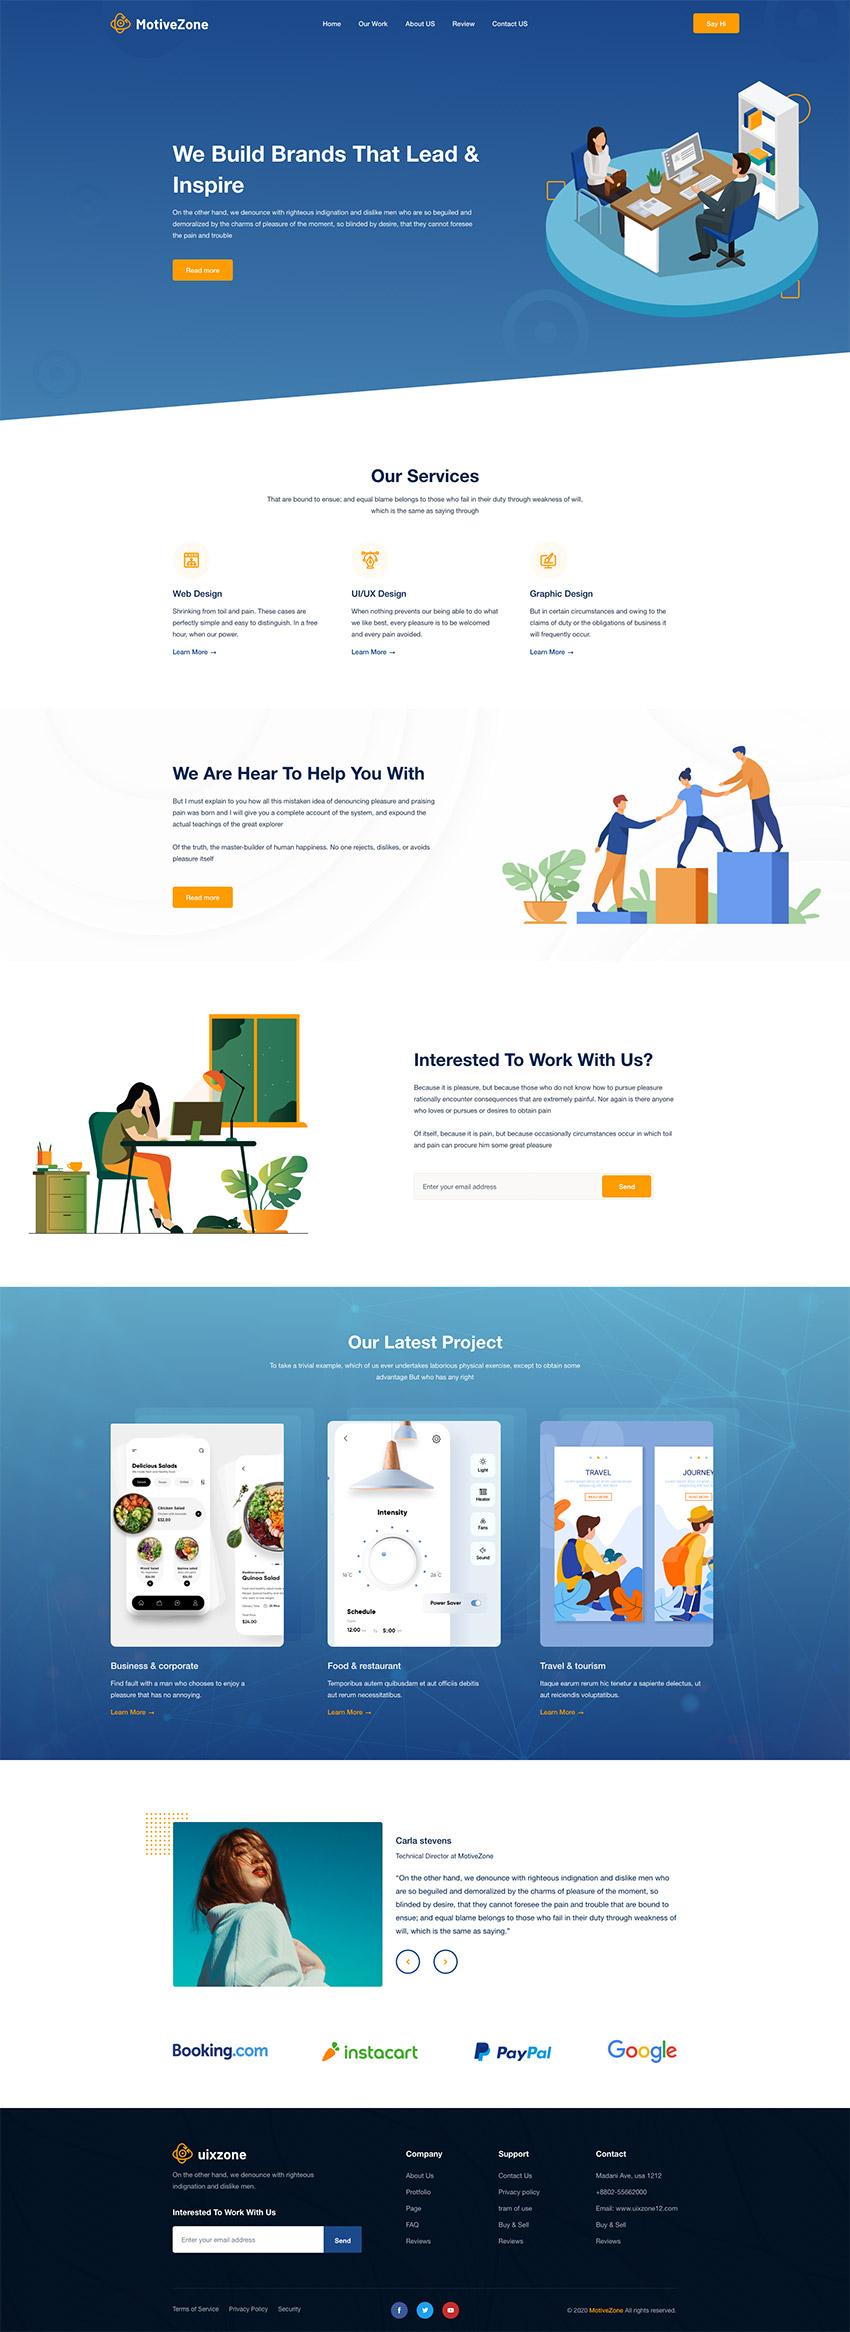 Agency Landing Page Design adobe xd free download